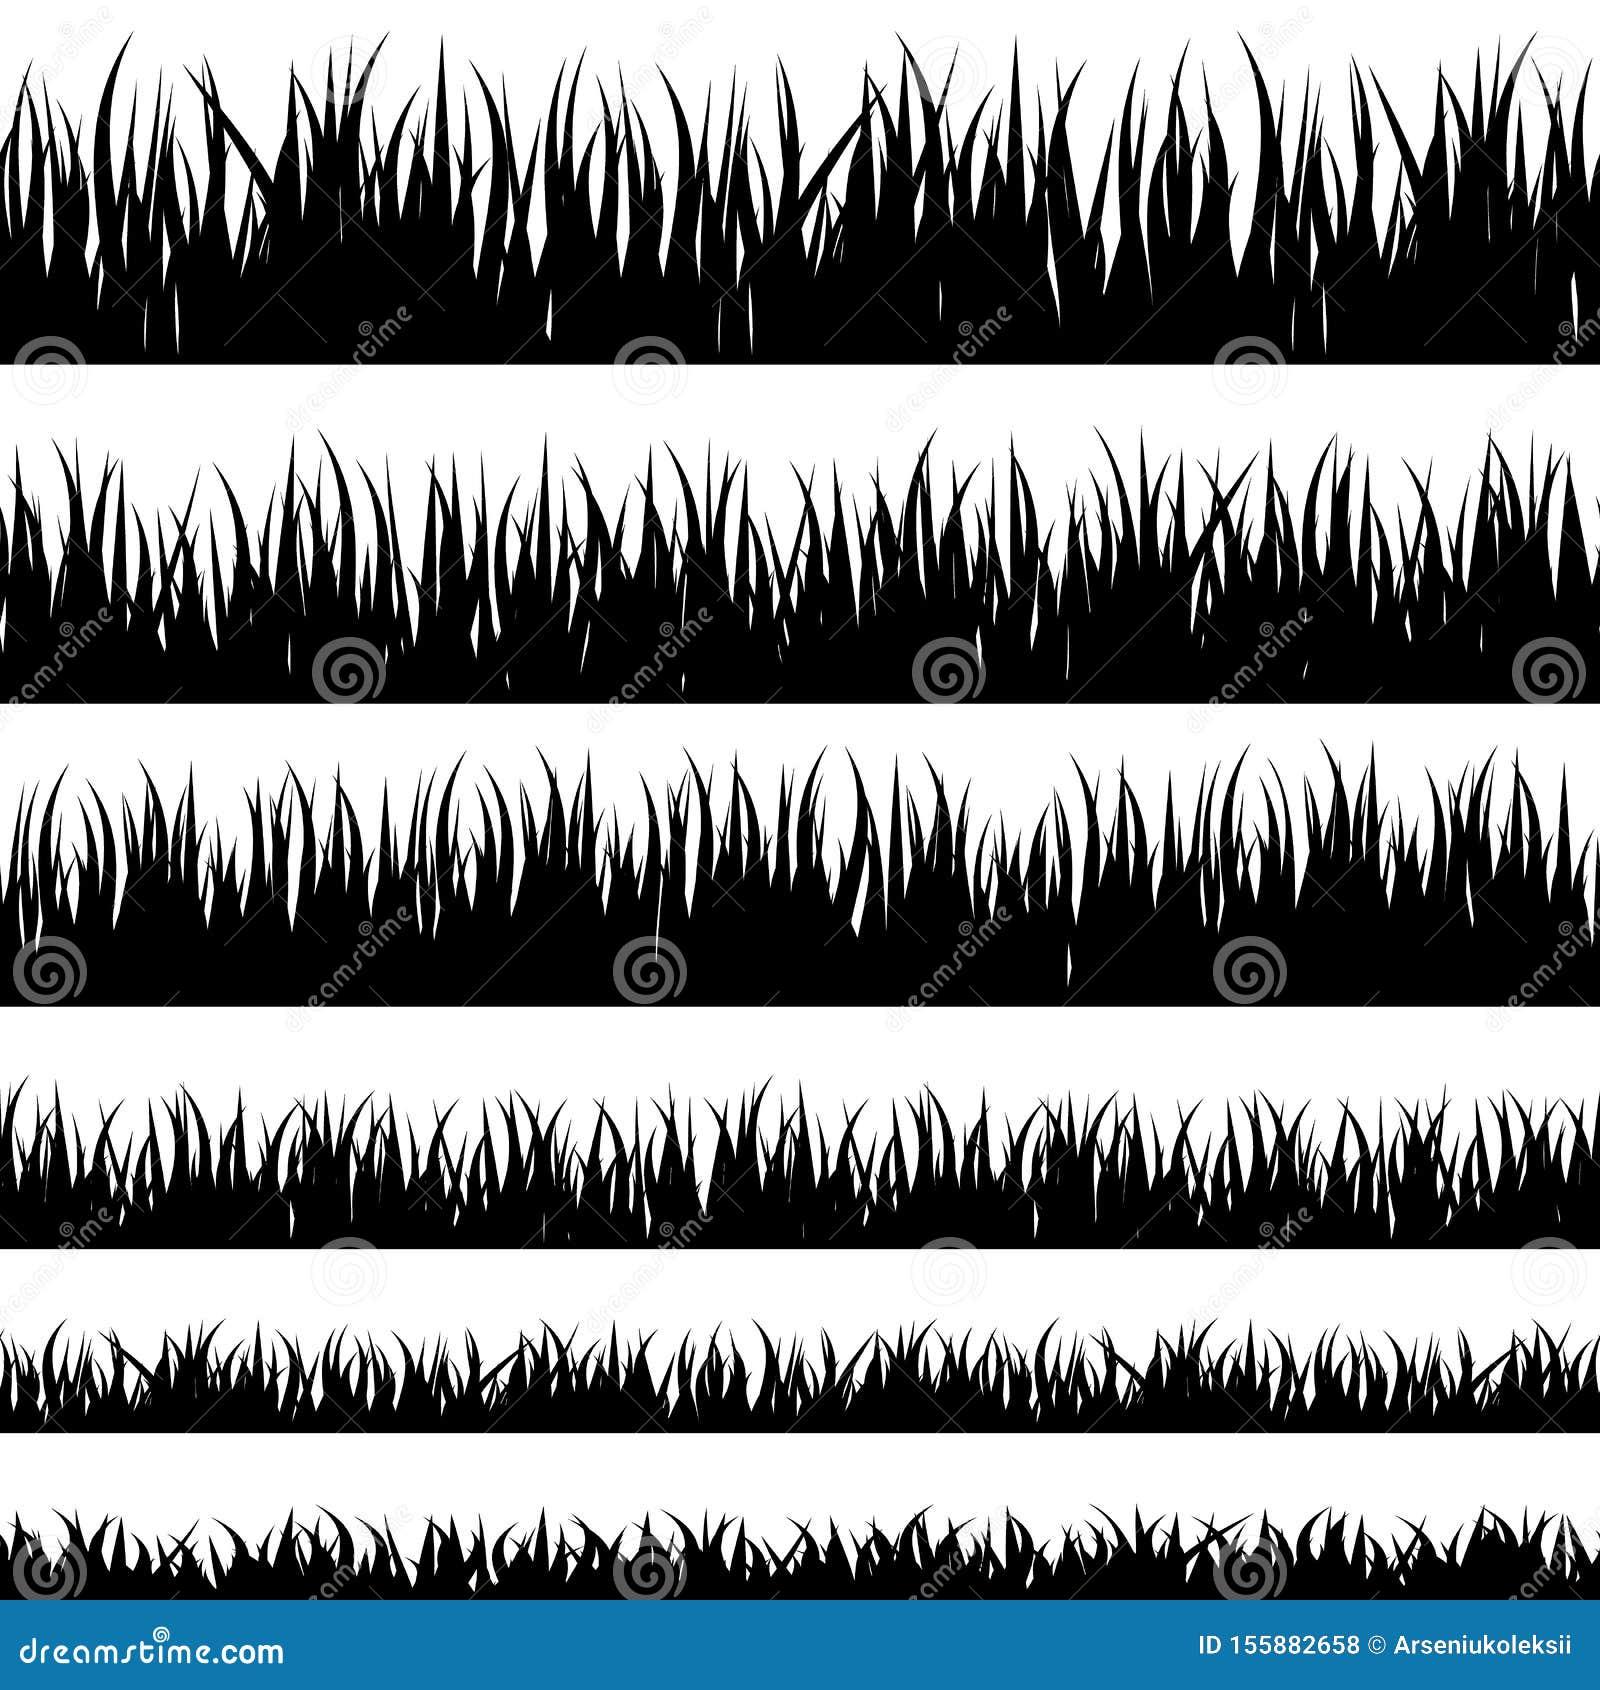 Grass black silhouette.